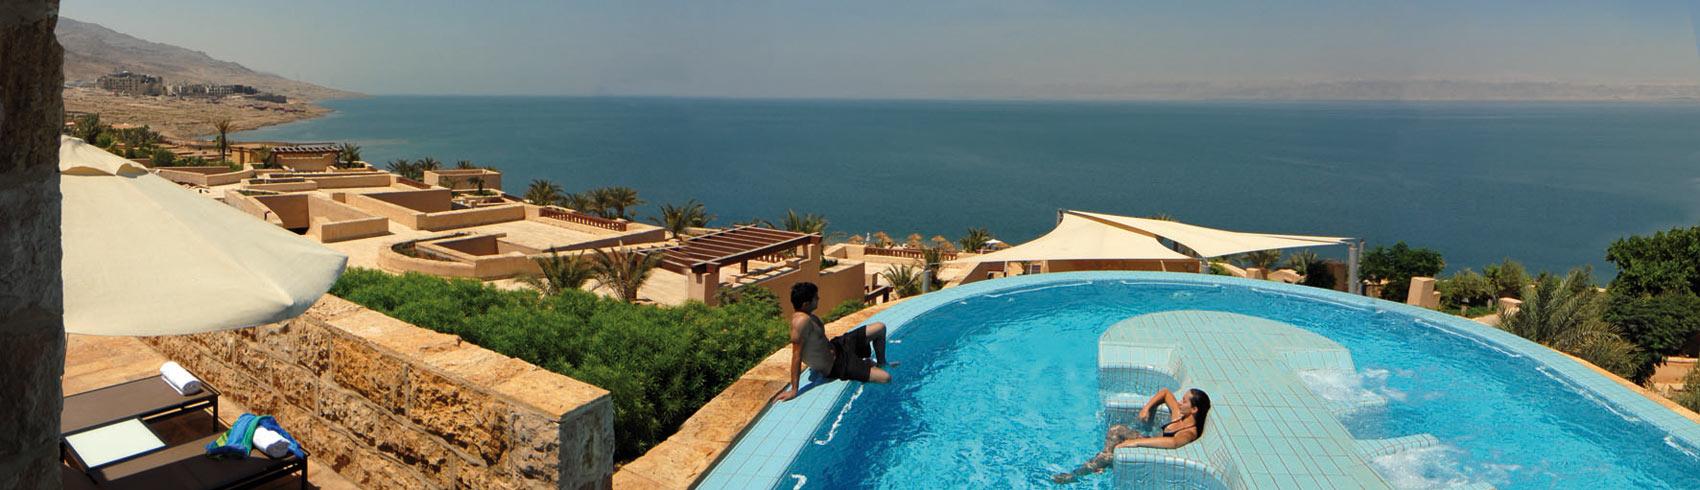 Movenpick Resort no Mar Morto